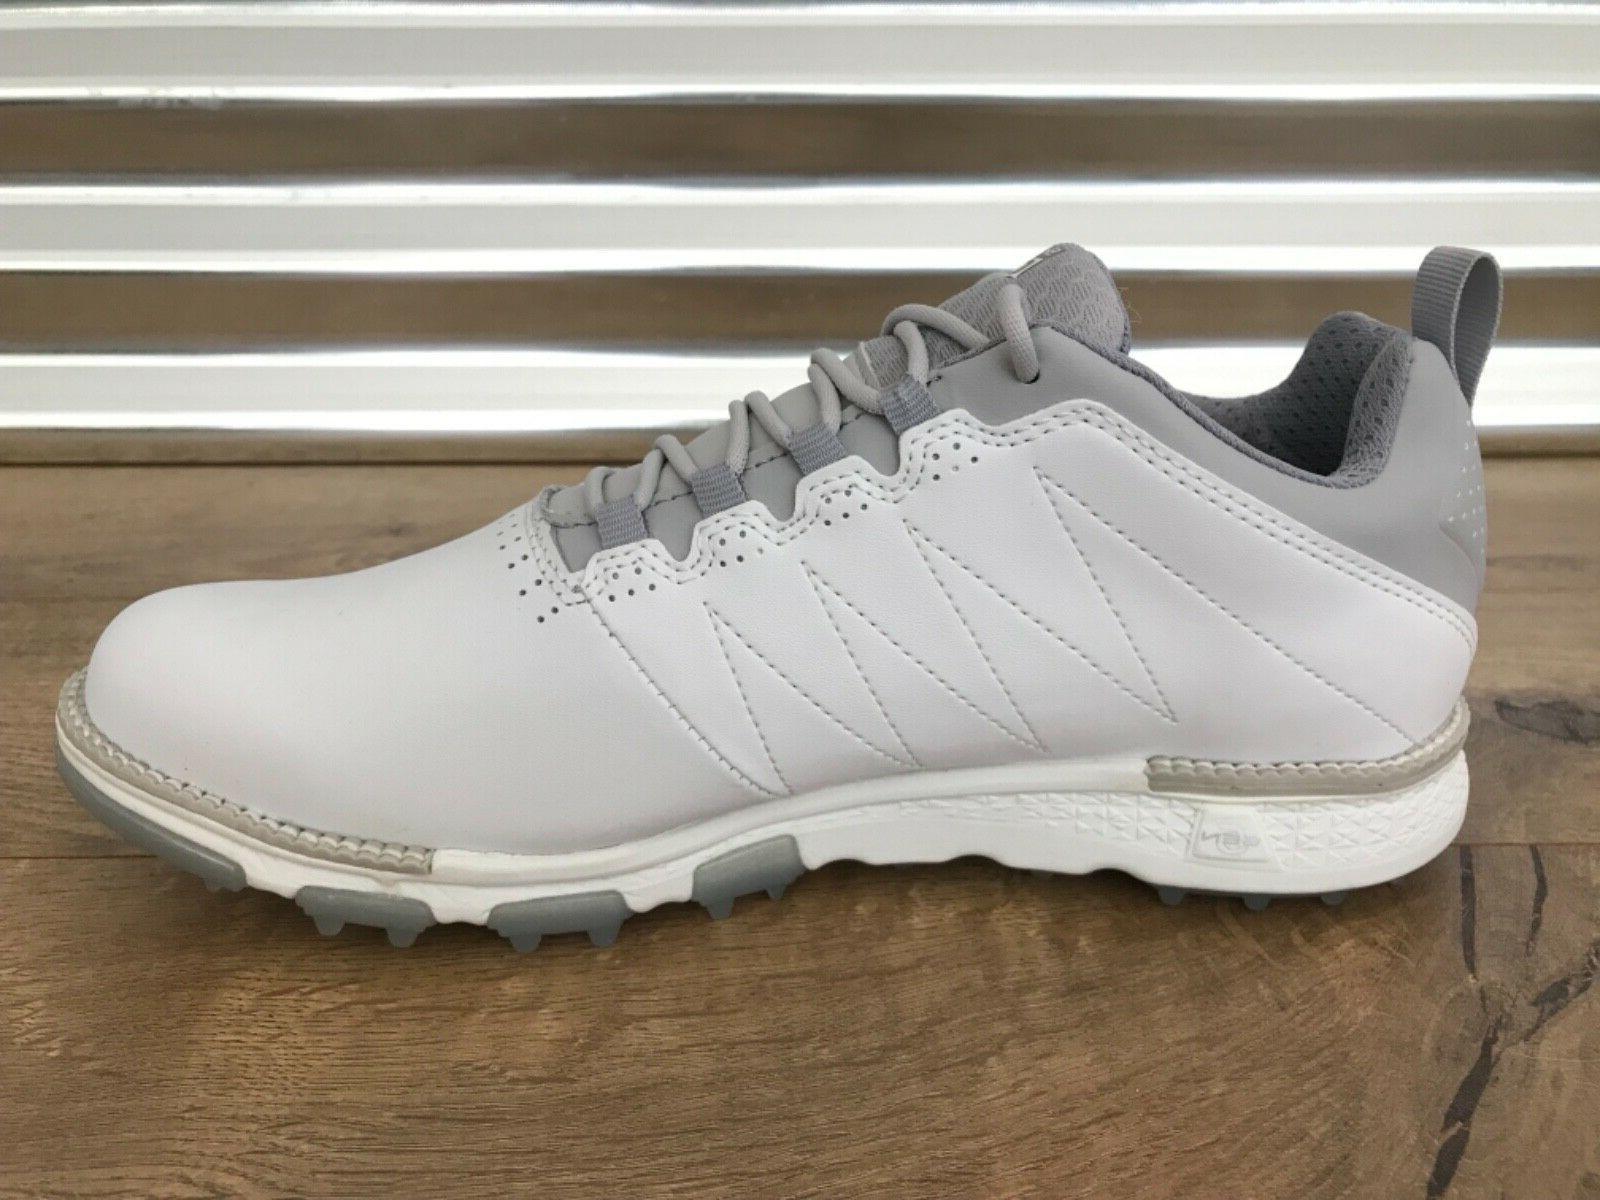 Skechers V3 Shoes White Gray